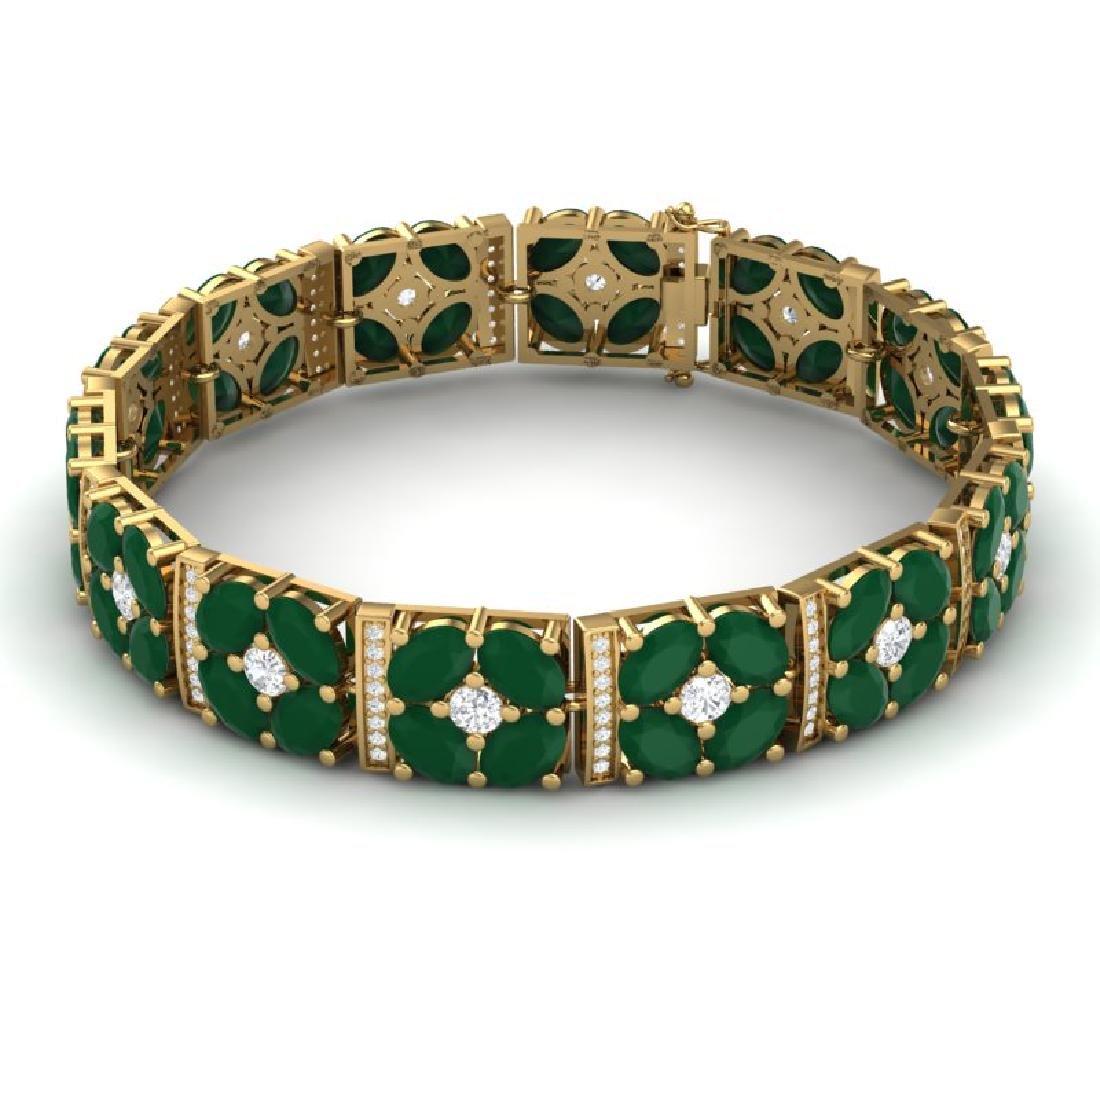 48.04 CTW Royalty Emerald & VS Diamond Bracelet 18K - 3